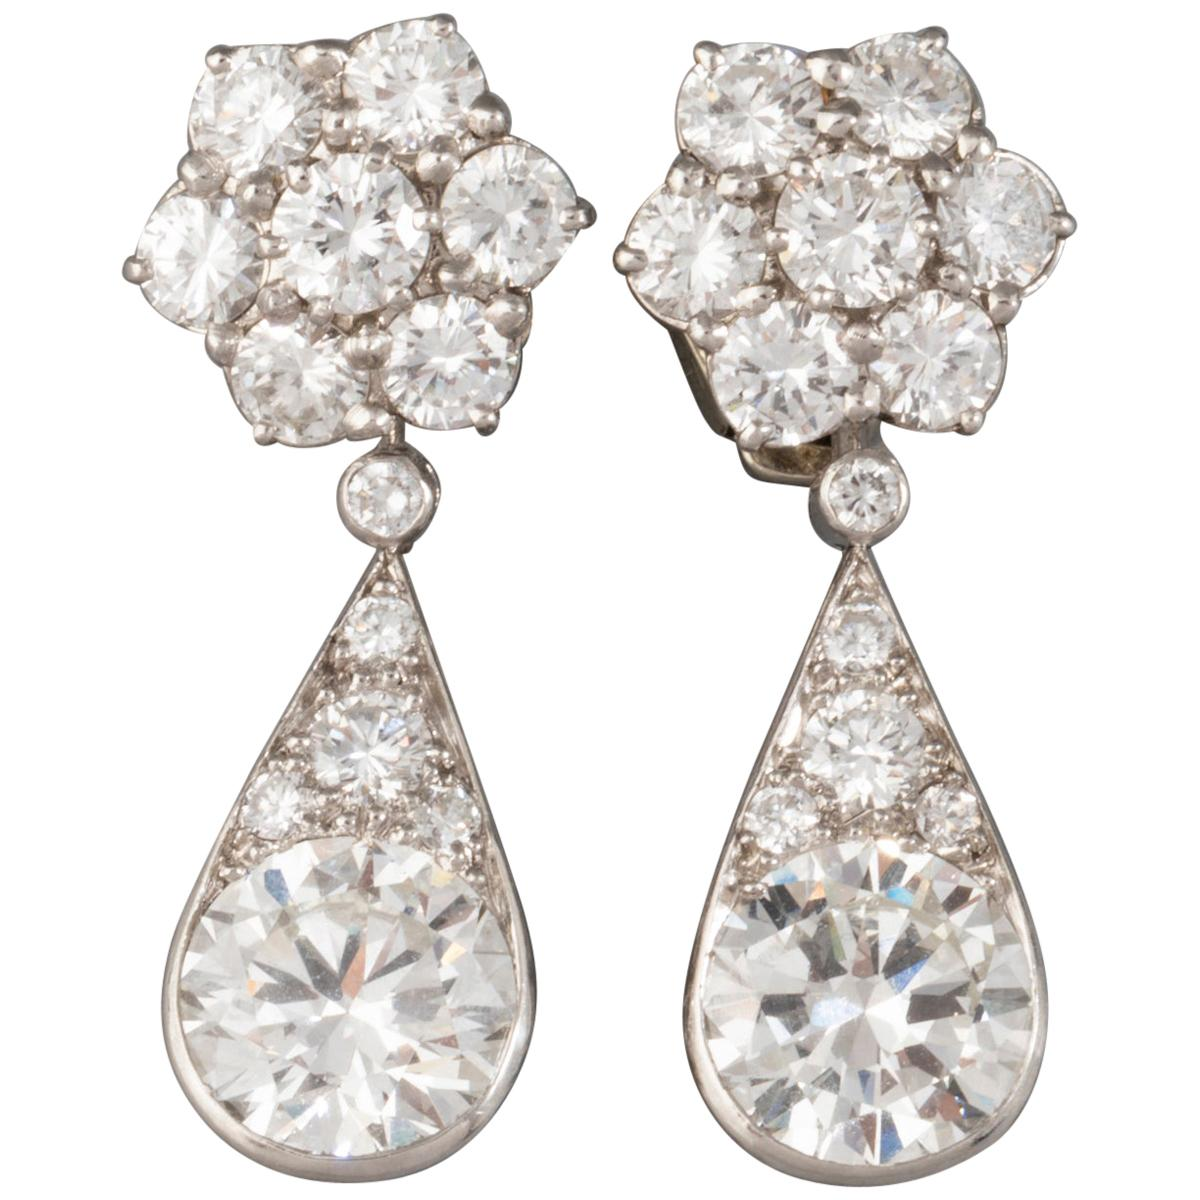 6.60 Carat Diamonds French Art Deco Earrings